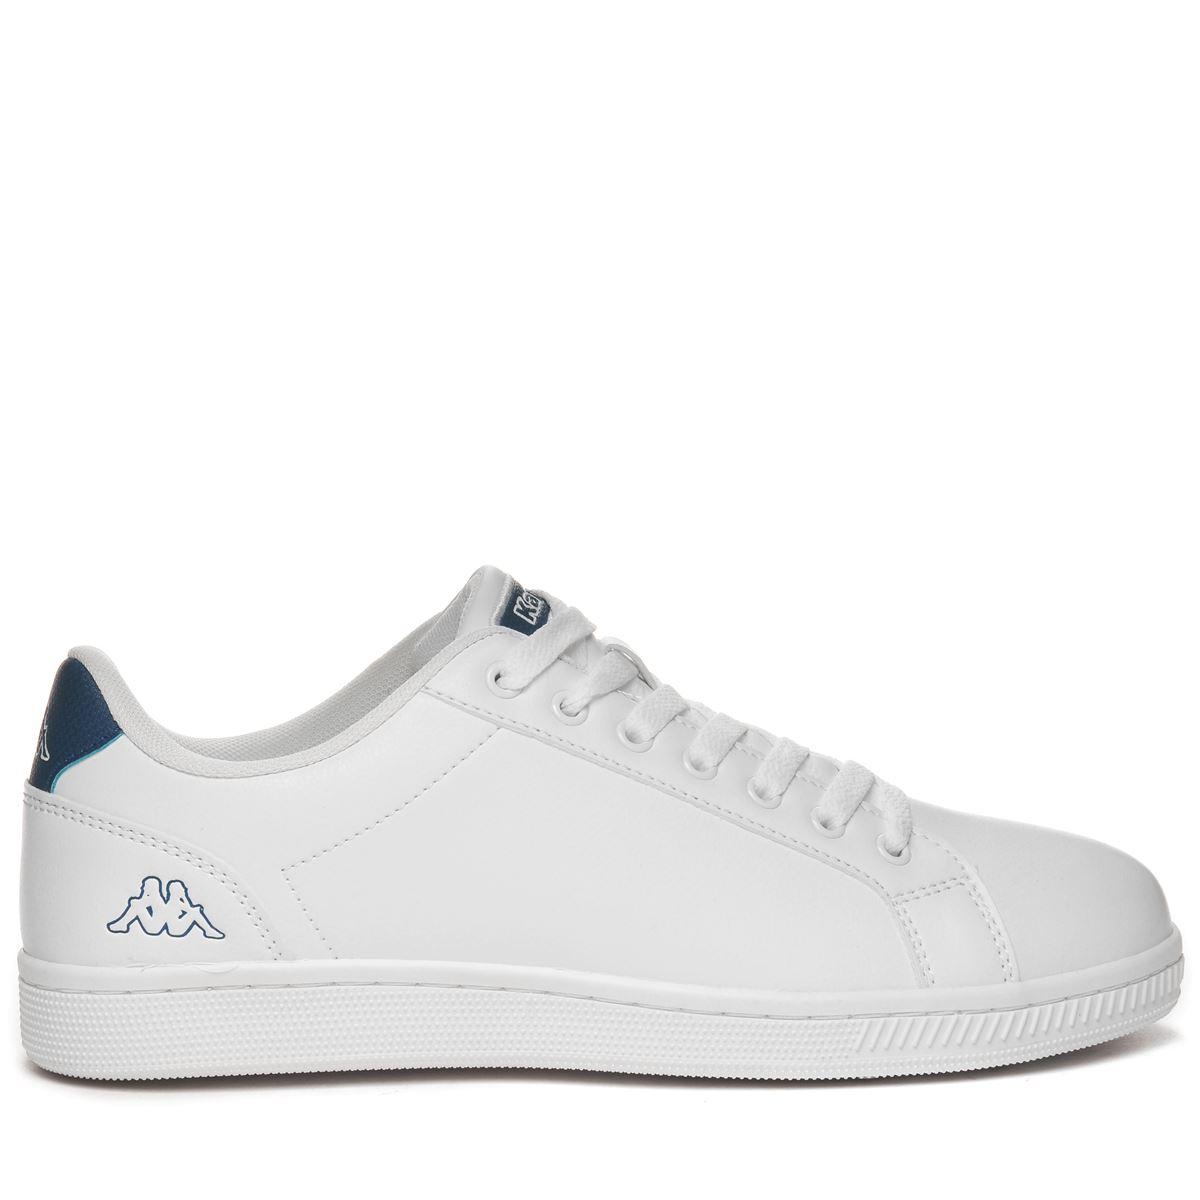 Kappa-Scarpe-Sneakers-Uomo-Donna-LOGO-GALTER-5-Camminata-Basso